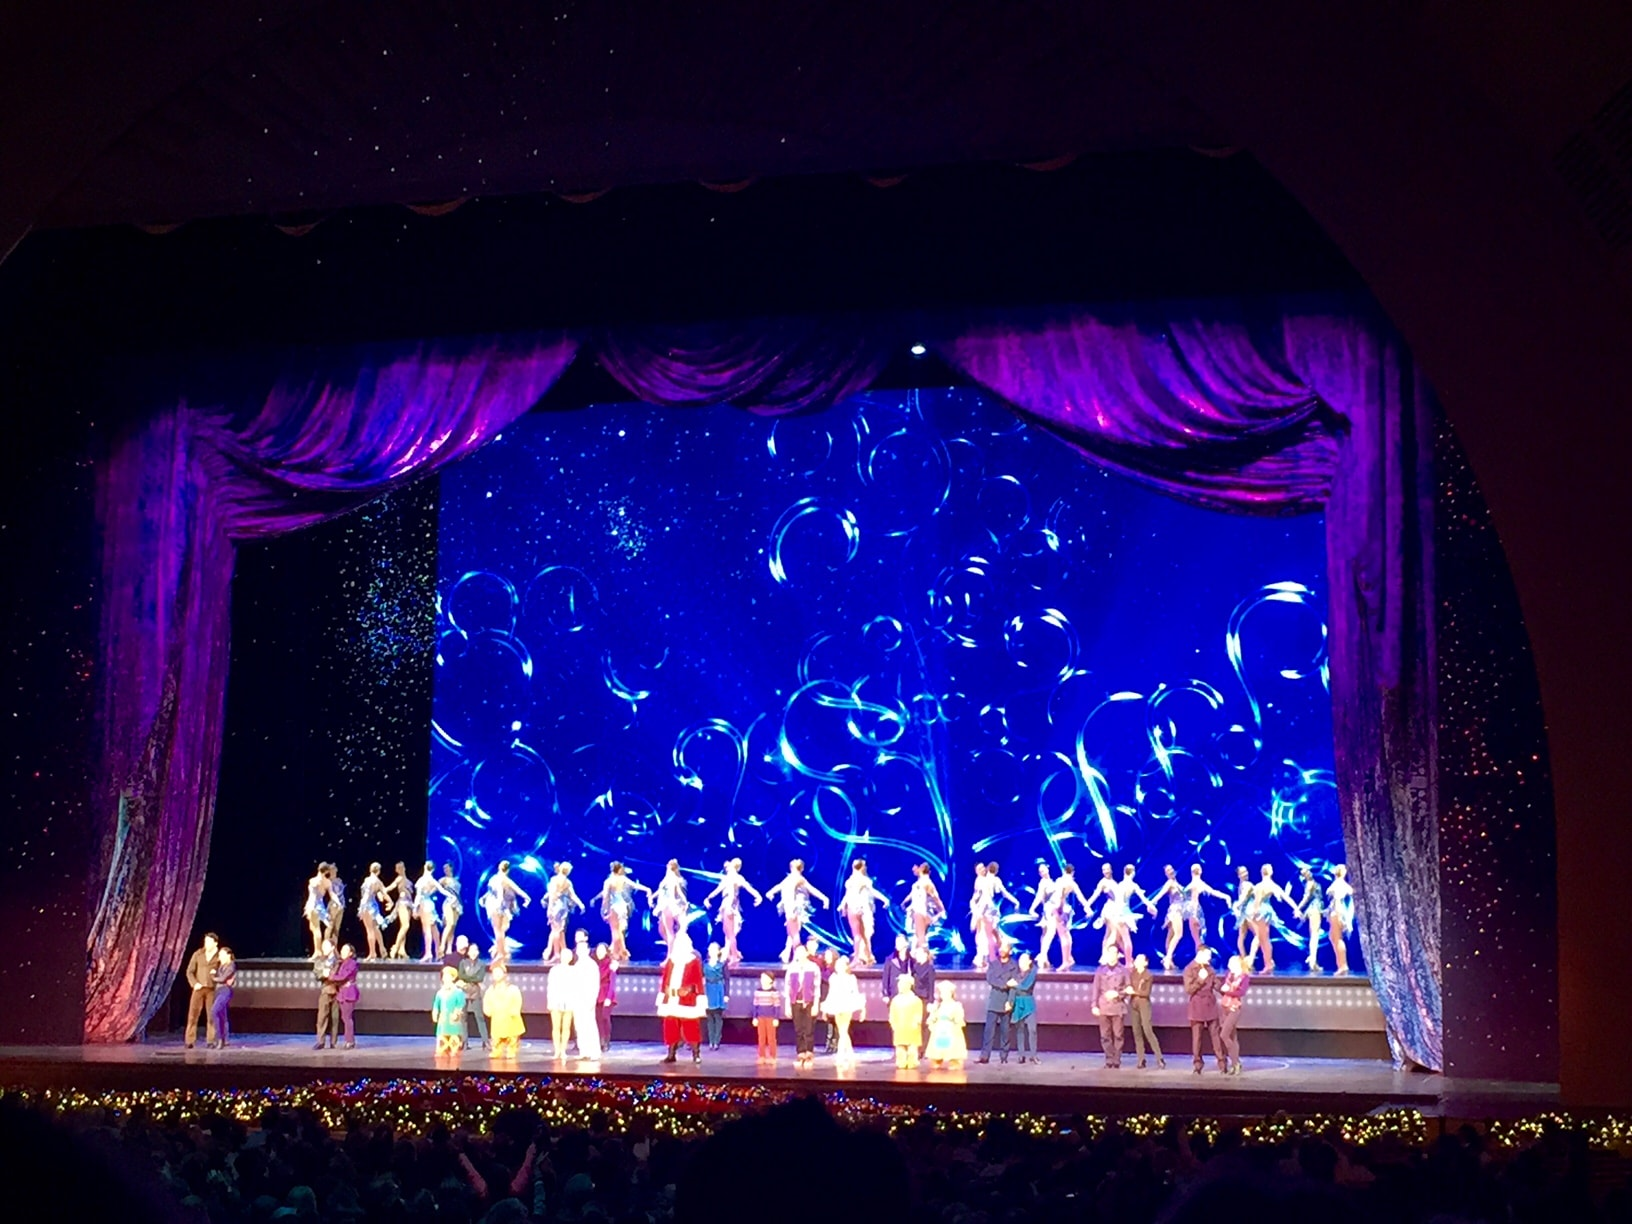 Santa and the Rockettes at the Radio City Christmas Spectacular